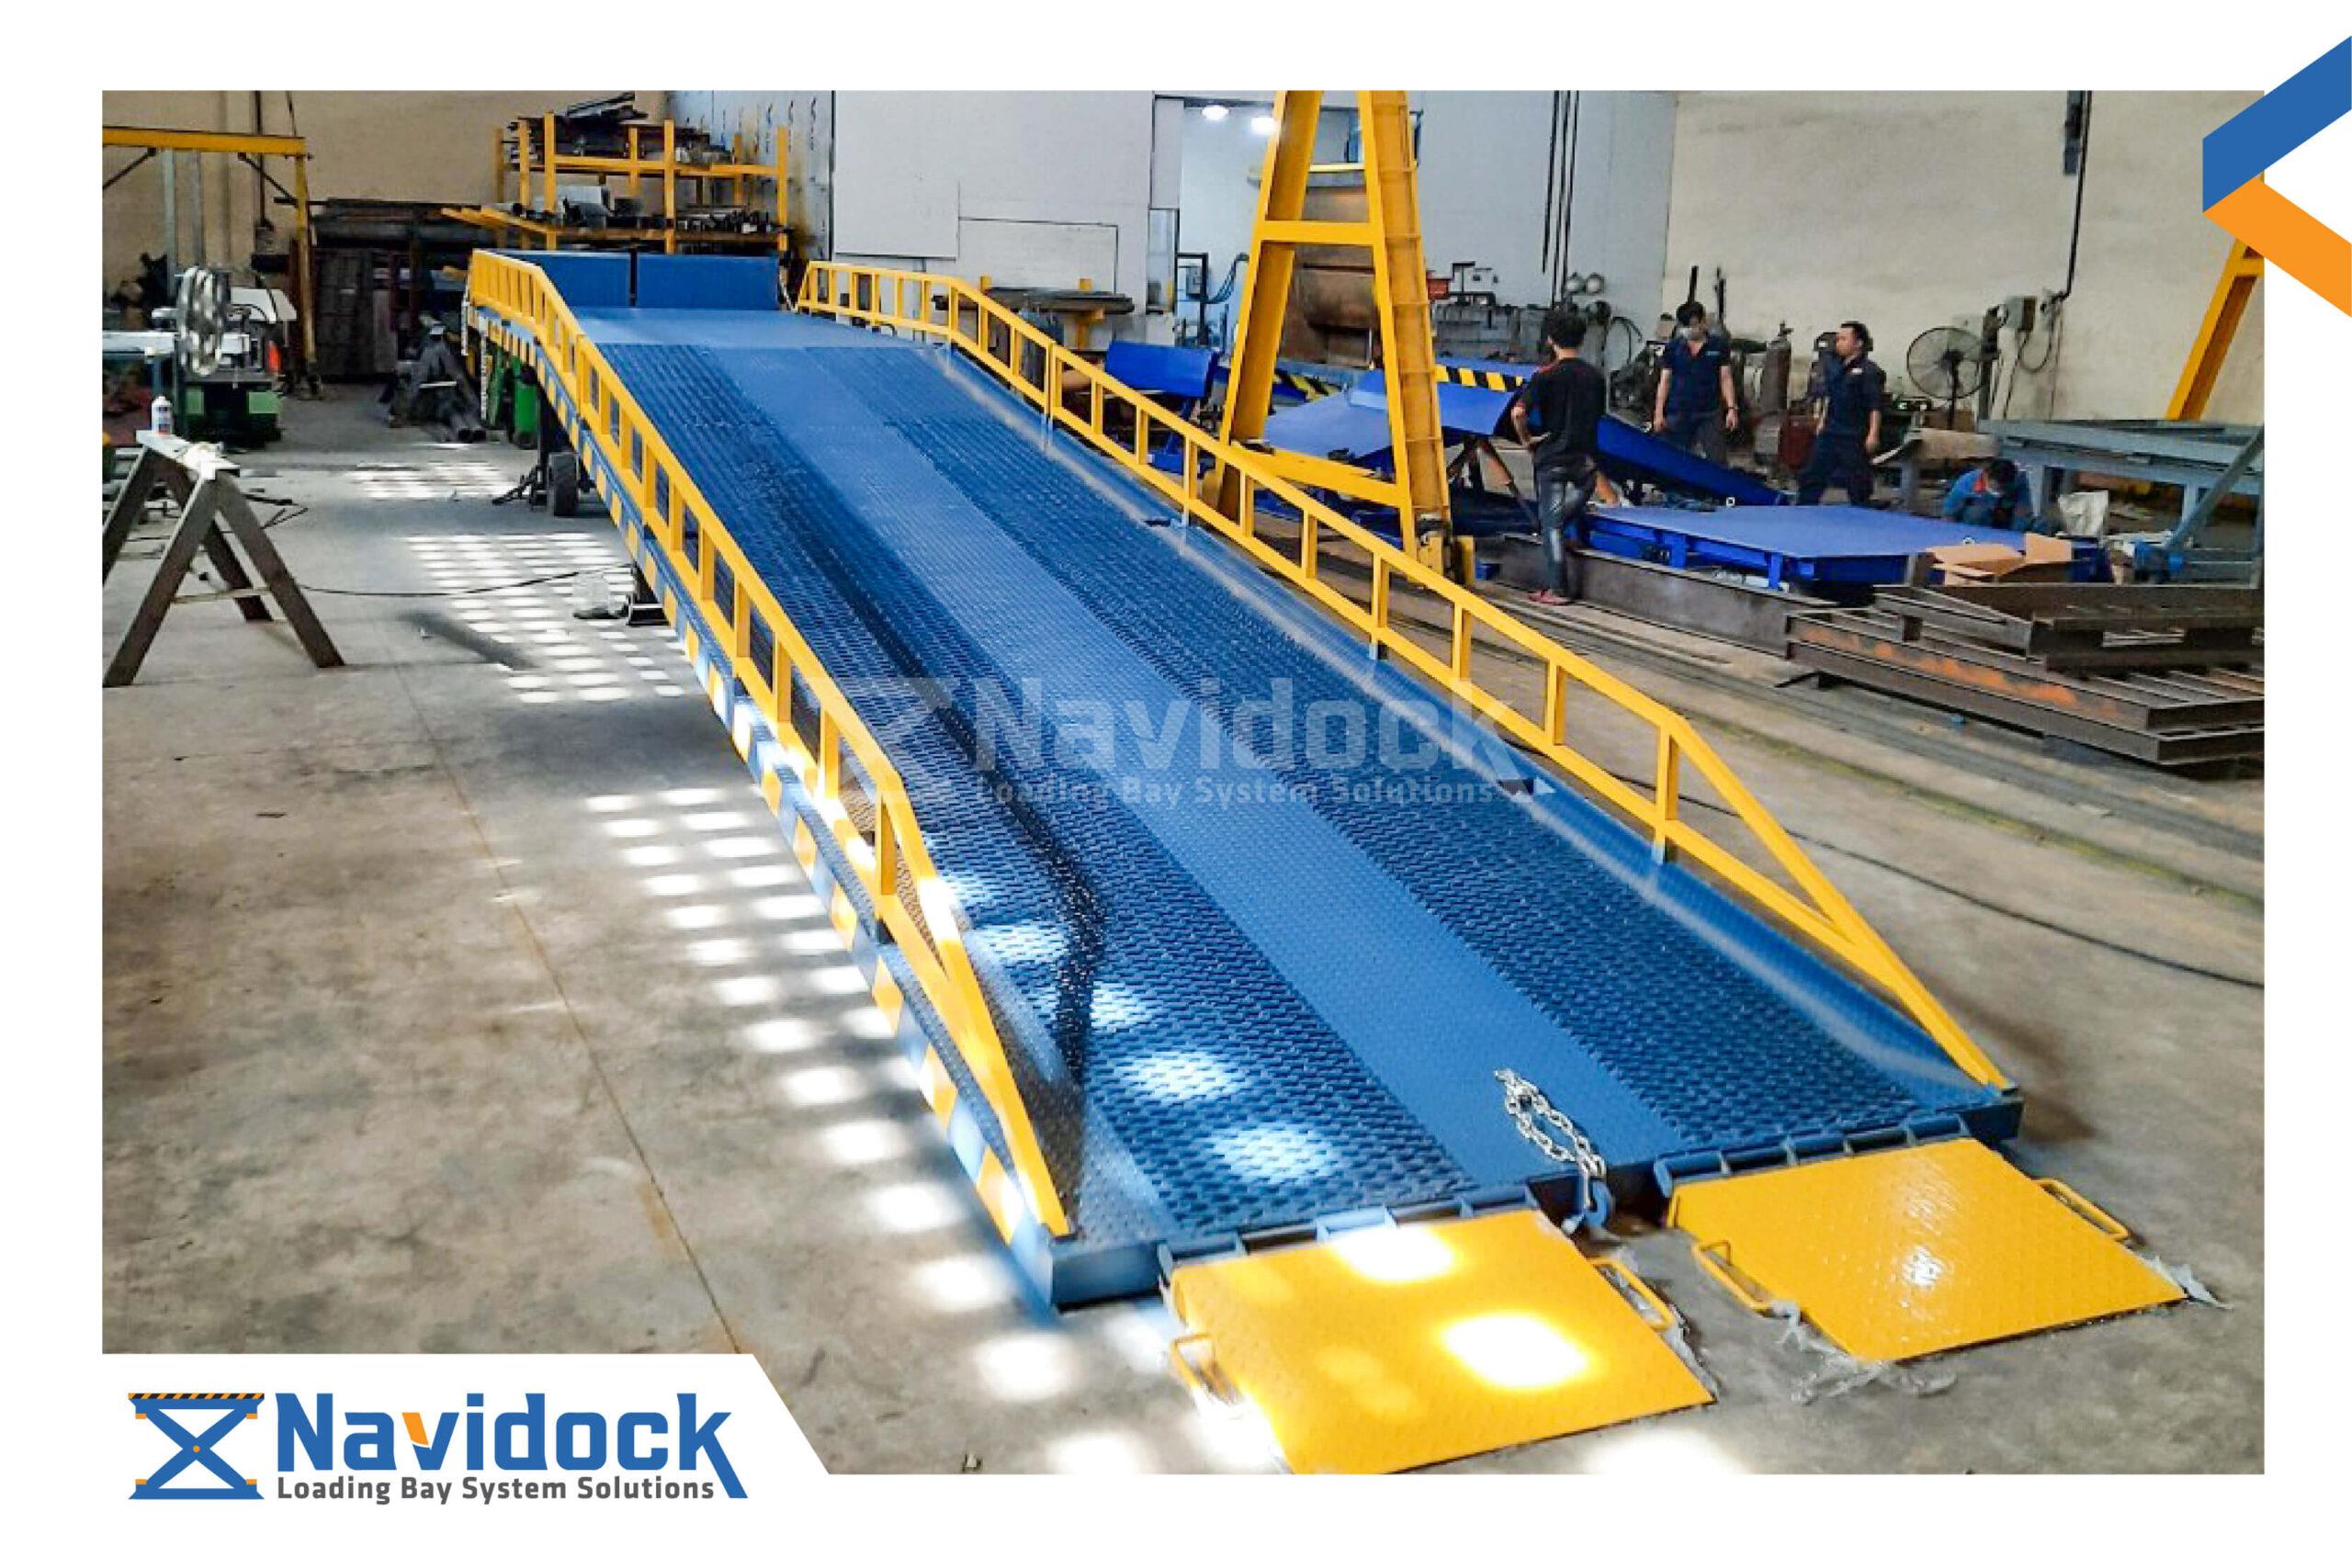 bao-gia-cau-dan-mobile-yard-ramp-navidock